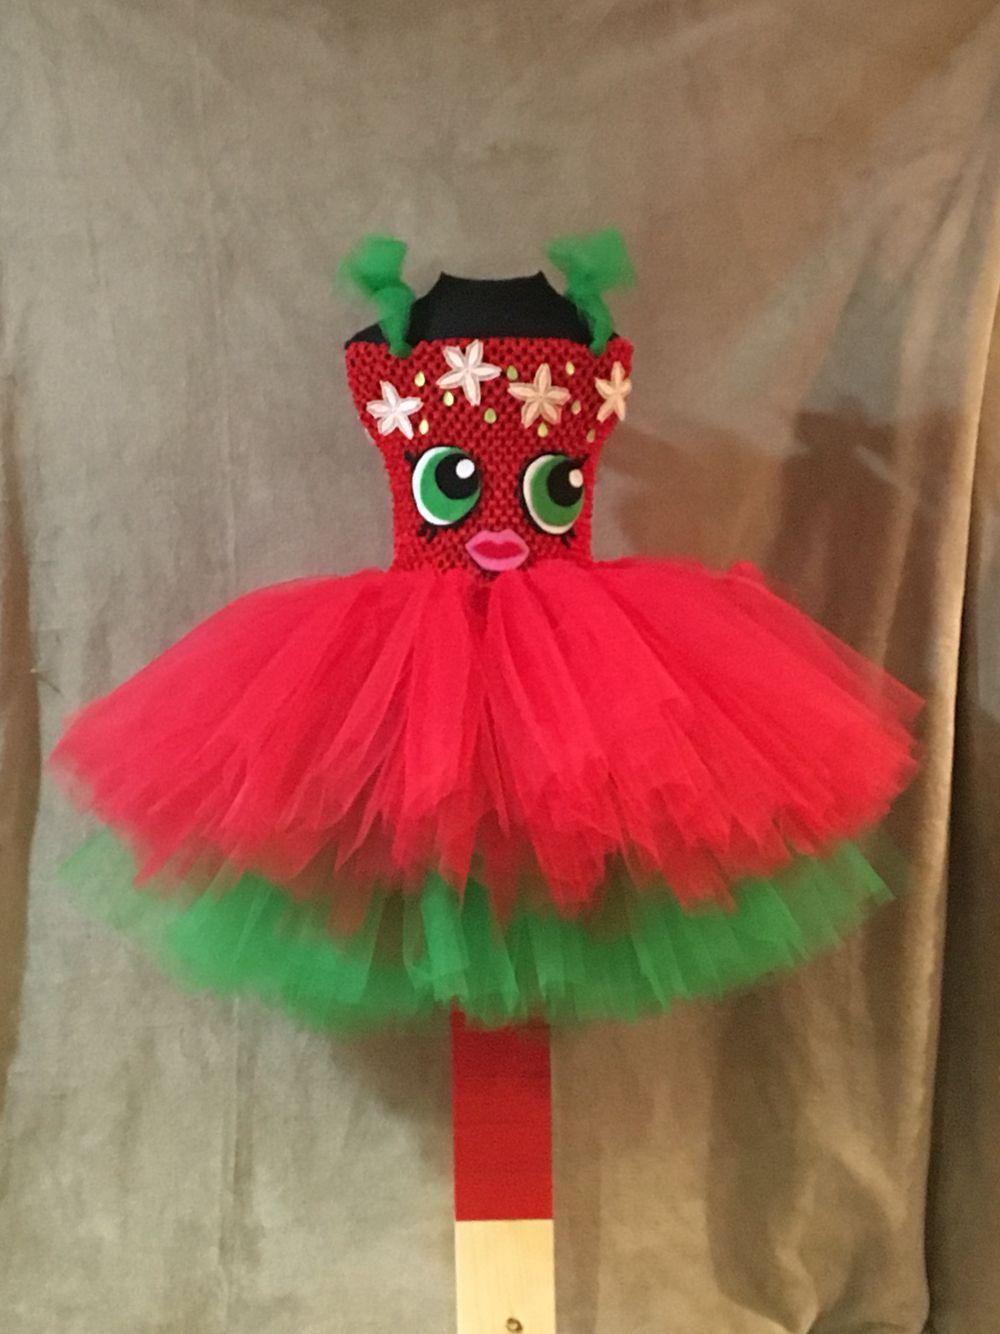 Strawberry Kiss Tutu Dress Shopkin. | Dresses and Costumes | Pinterest